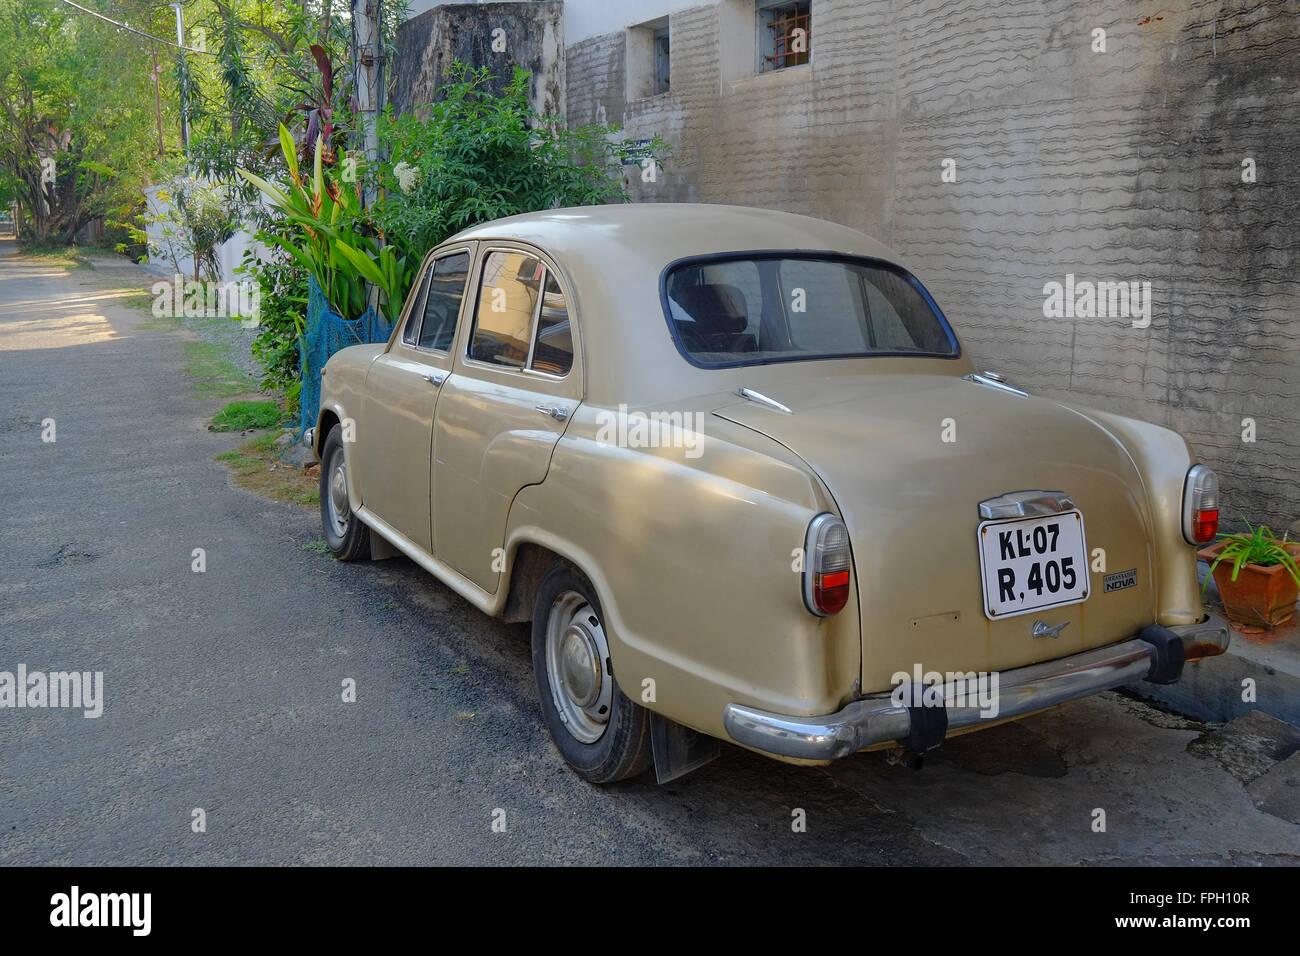 An Ambassador Car In The Old Town Of Kochi Kerala India Stock